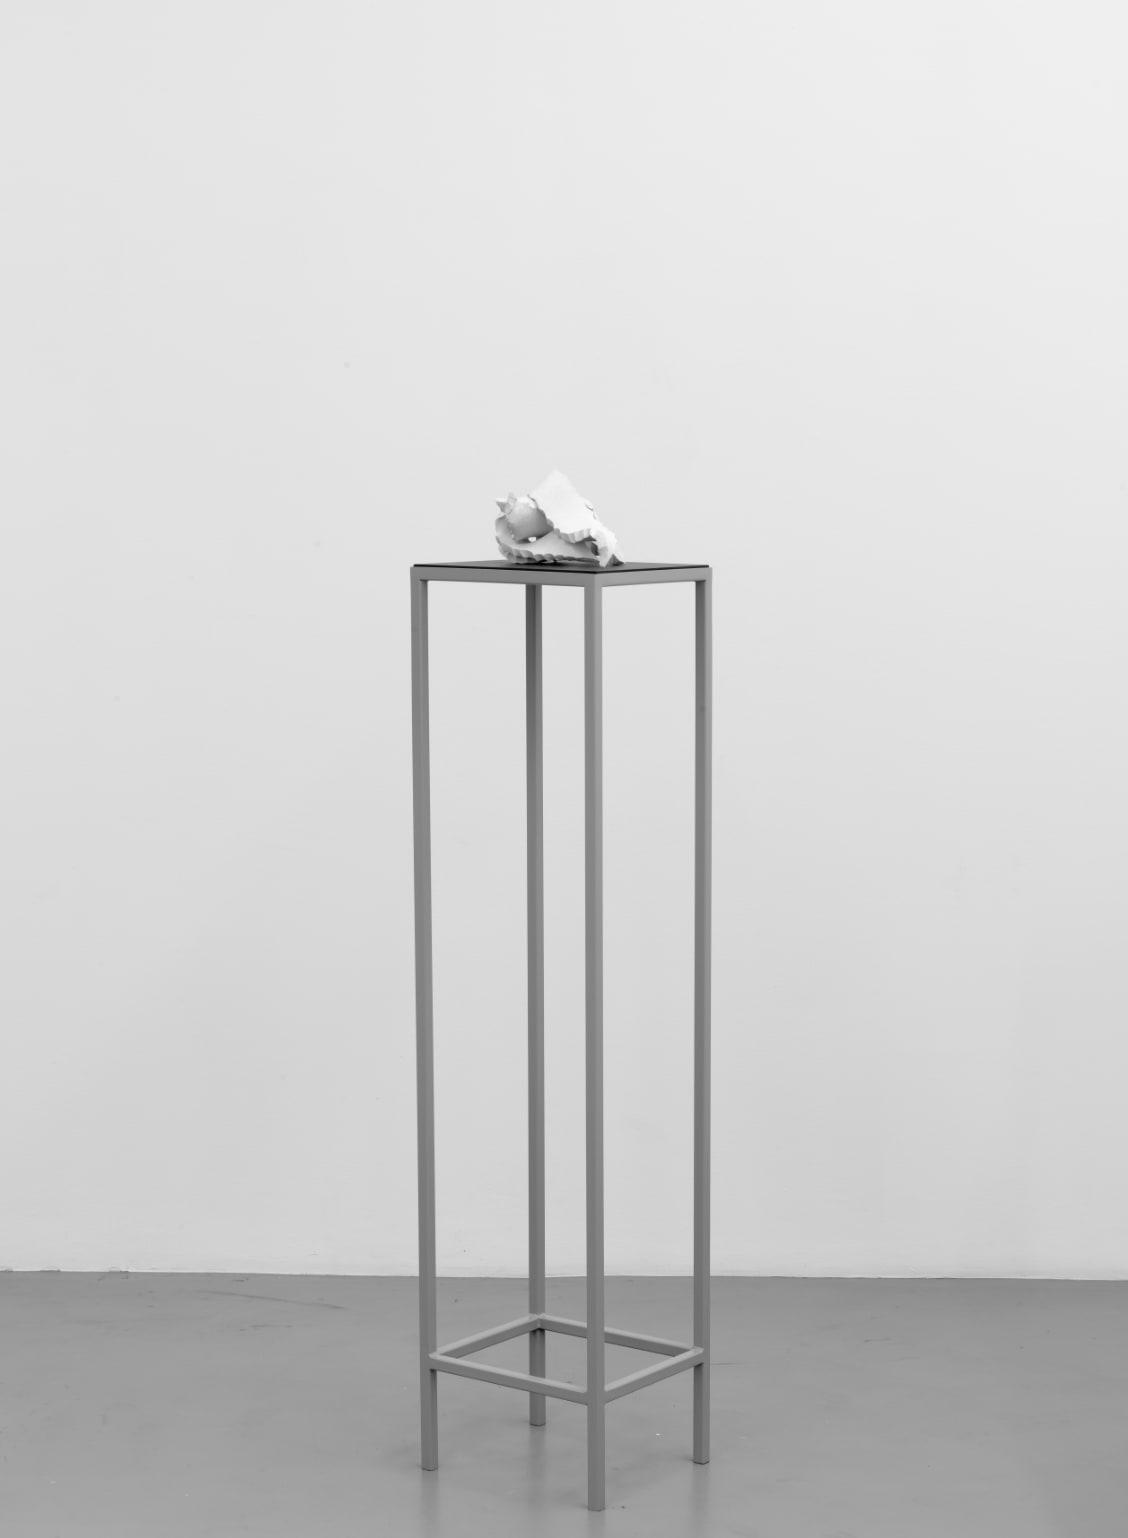 Lili DUJOURIE Epigramme 1, 2008 Metal, baked clay 148.5 x 33 x 29.5 cm